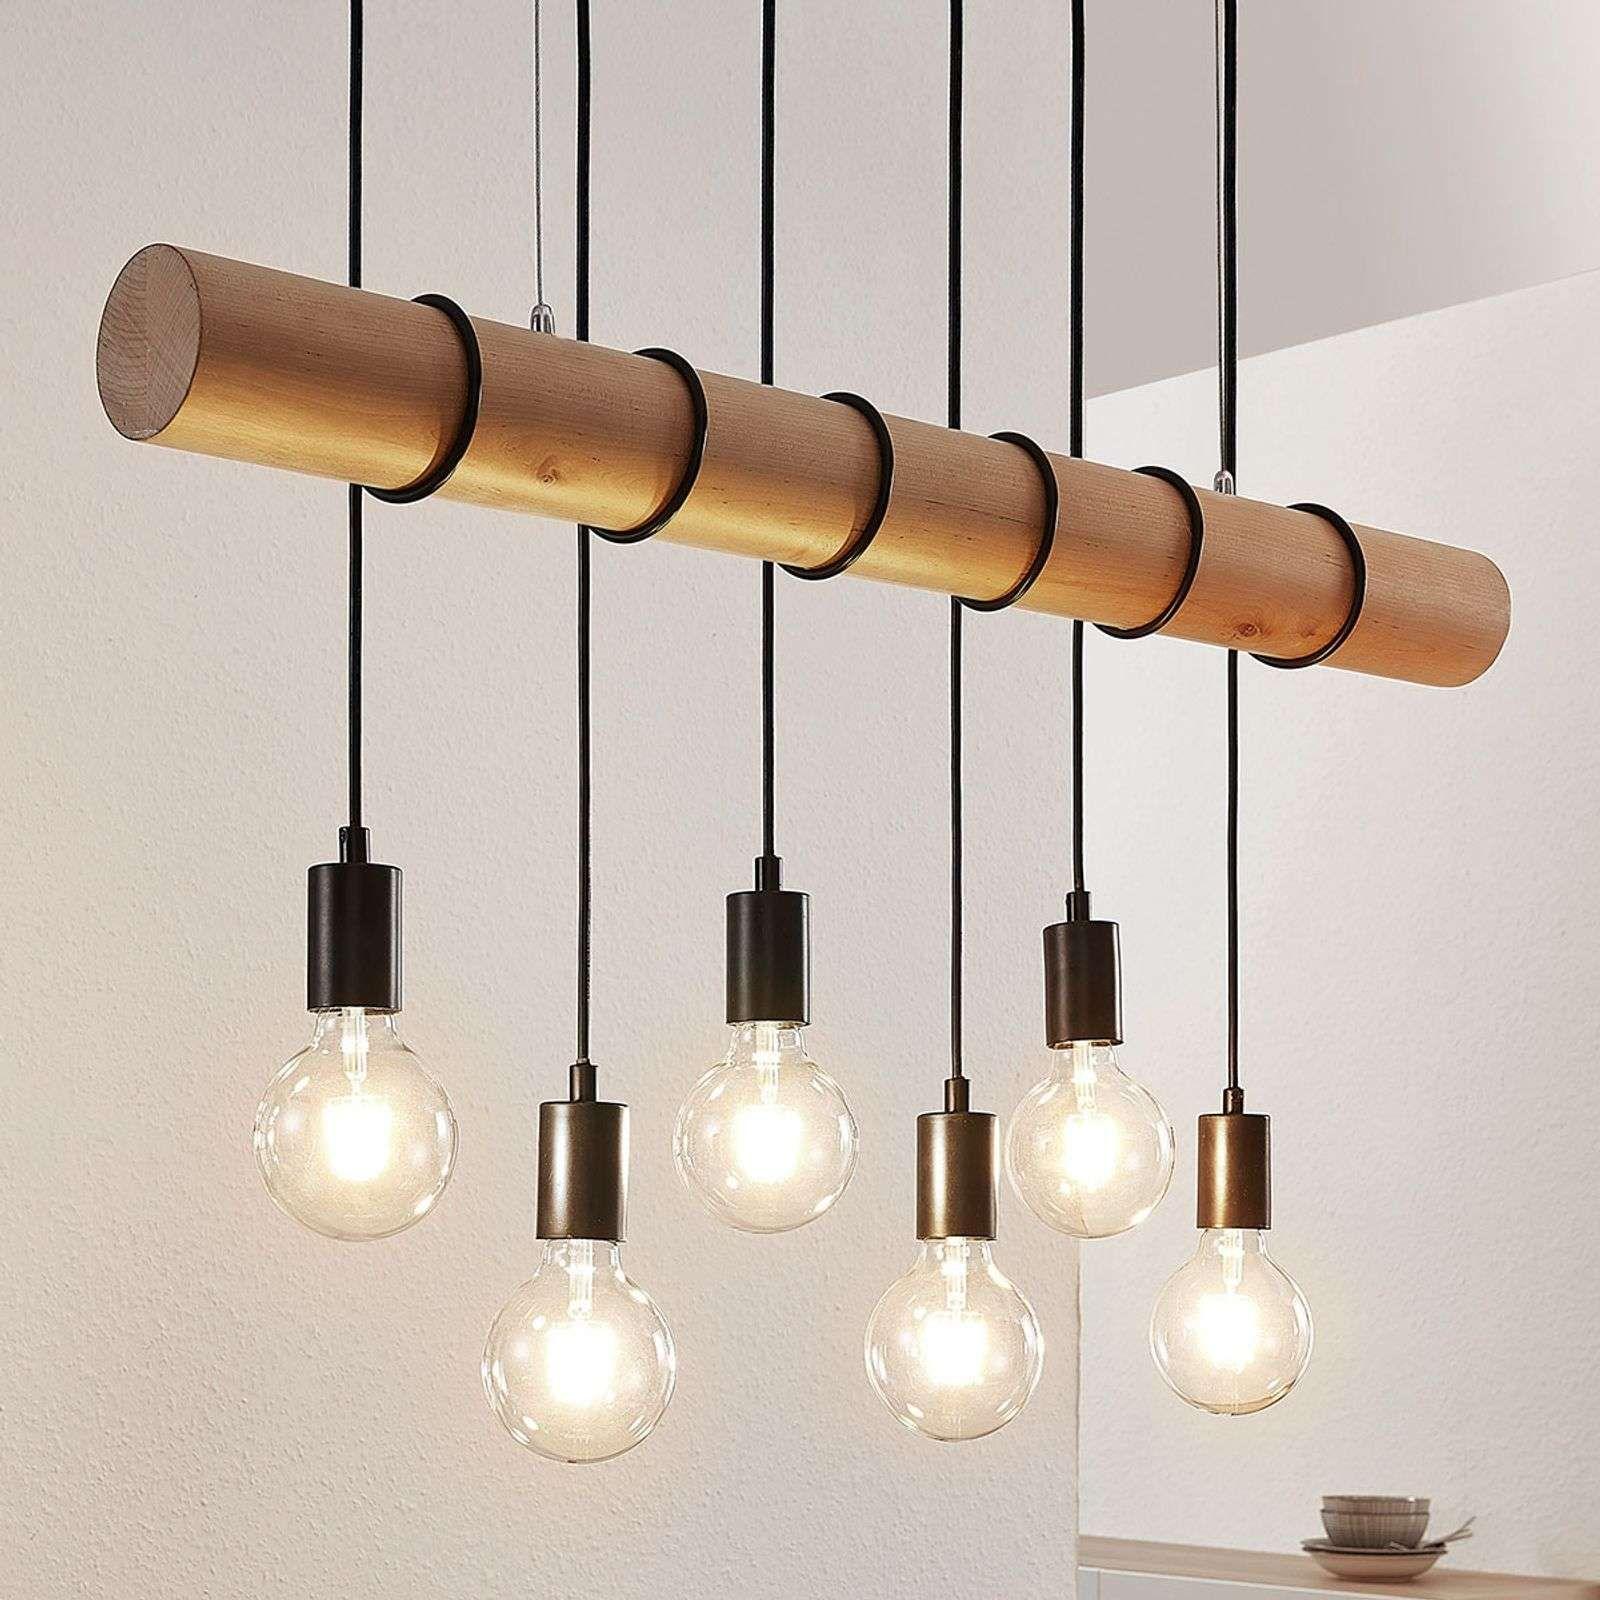 Suspension Eviton En Bois A 6 Lampes Naturel In 2020 Holzpendelleuchte Dekorative Lampen Pendelleuchte Kuche